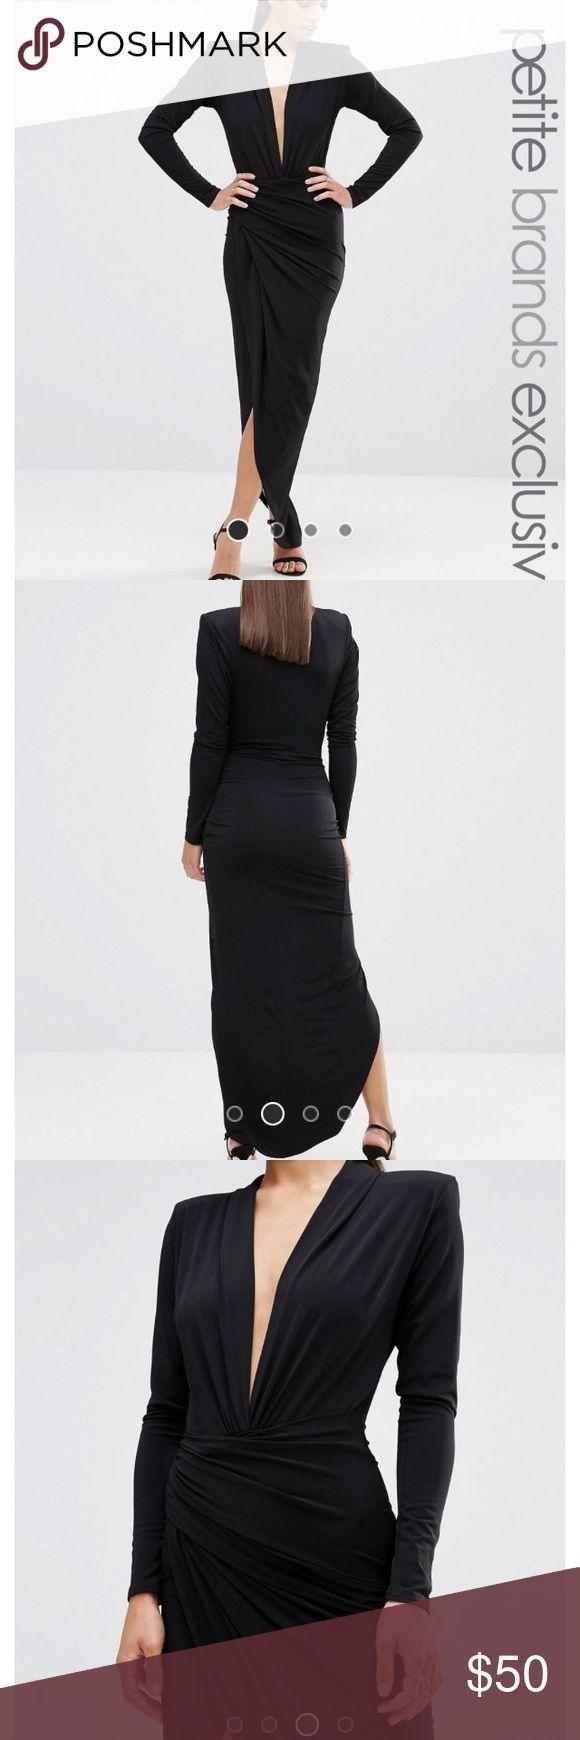 ASOS petite john zack dress John Zack Petite dress from ASOS. Plunge neckline, stretch slim fit dress with thigh slit & structured shoulders. US size 2 ASOS Petite Dresses Midi